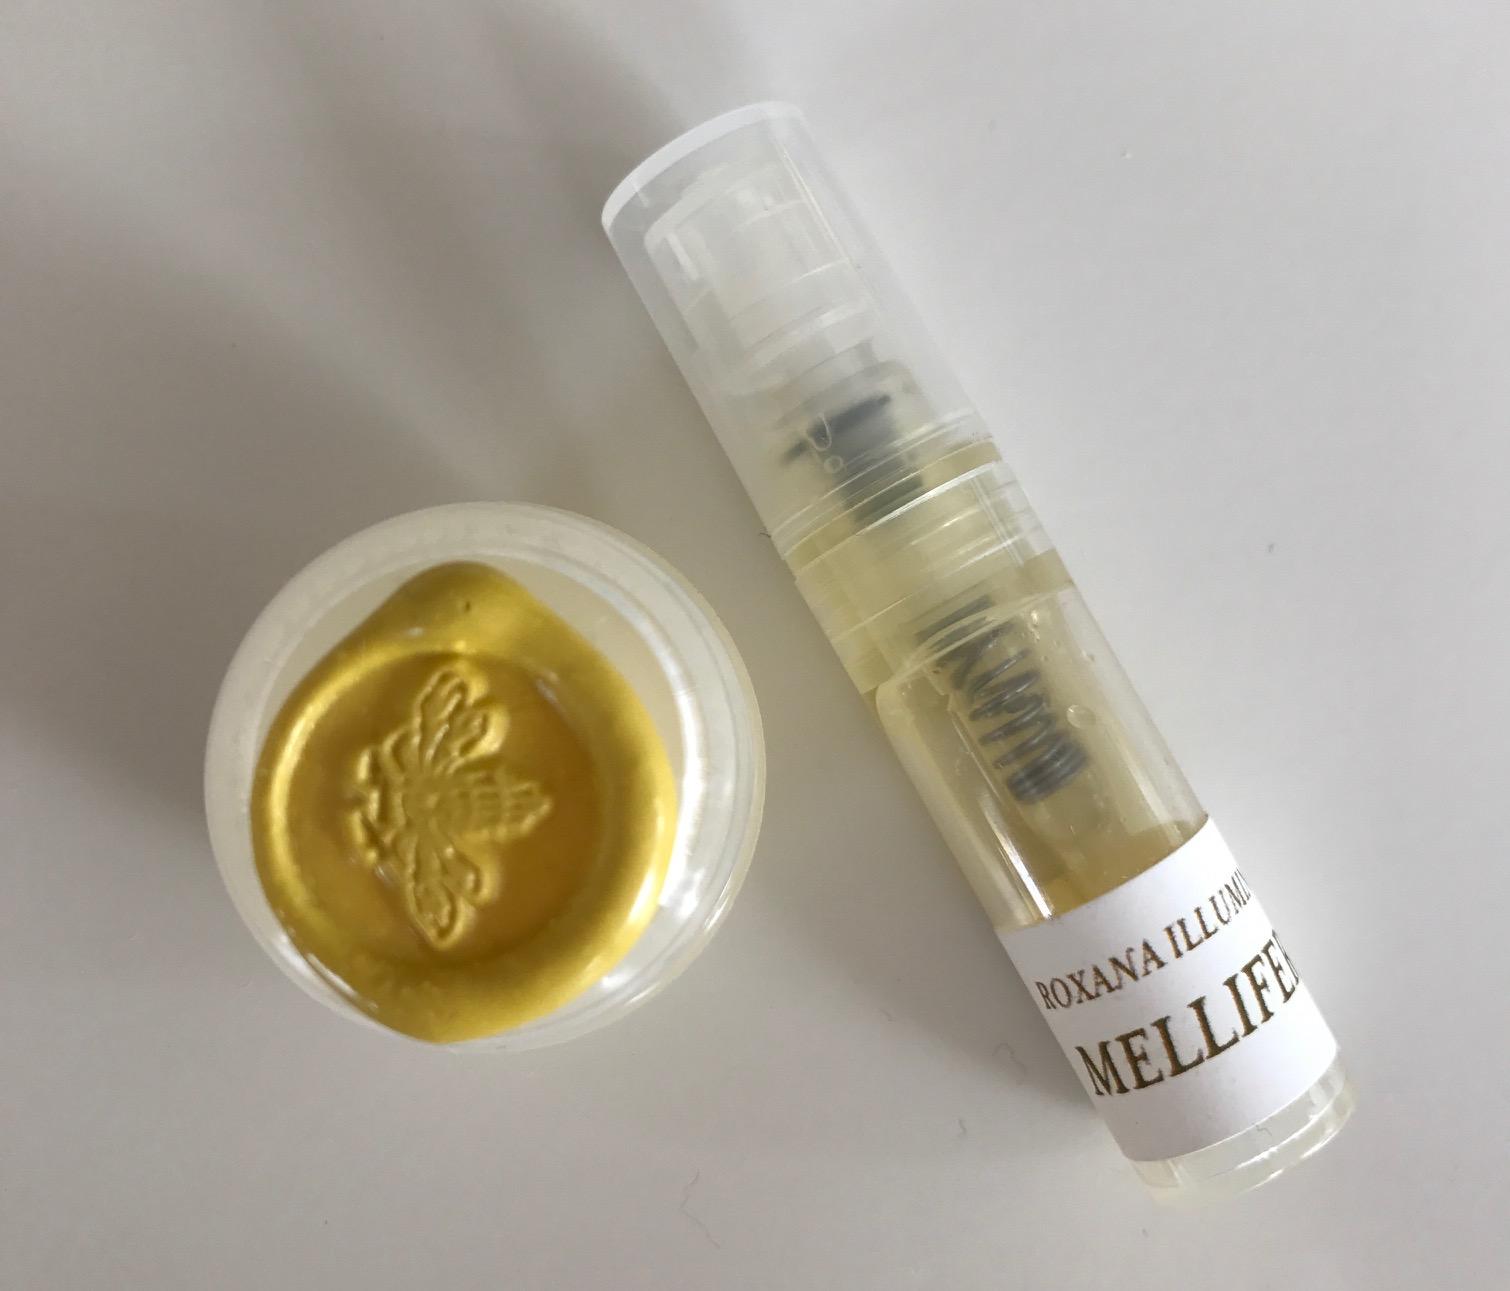 Scent Hive Roxana Illuminate Perfume